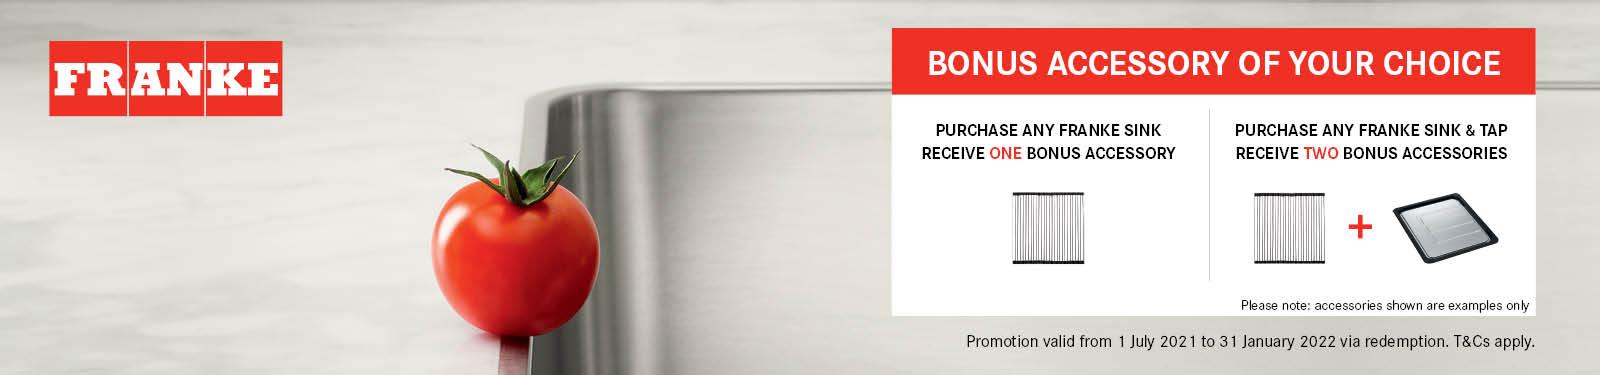 fks-spar-july-january-2022-bonus-accessories-.jpg